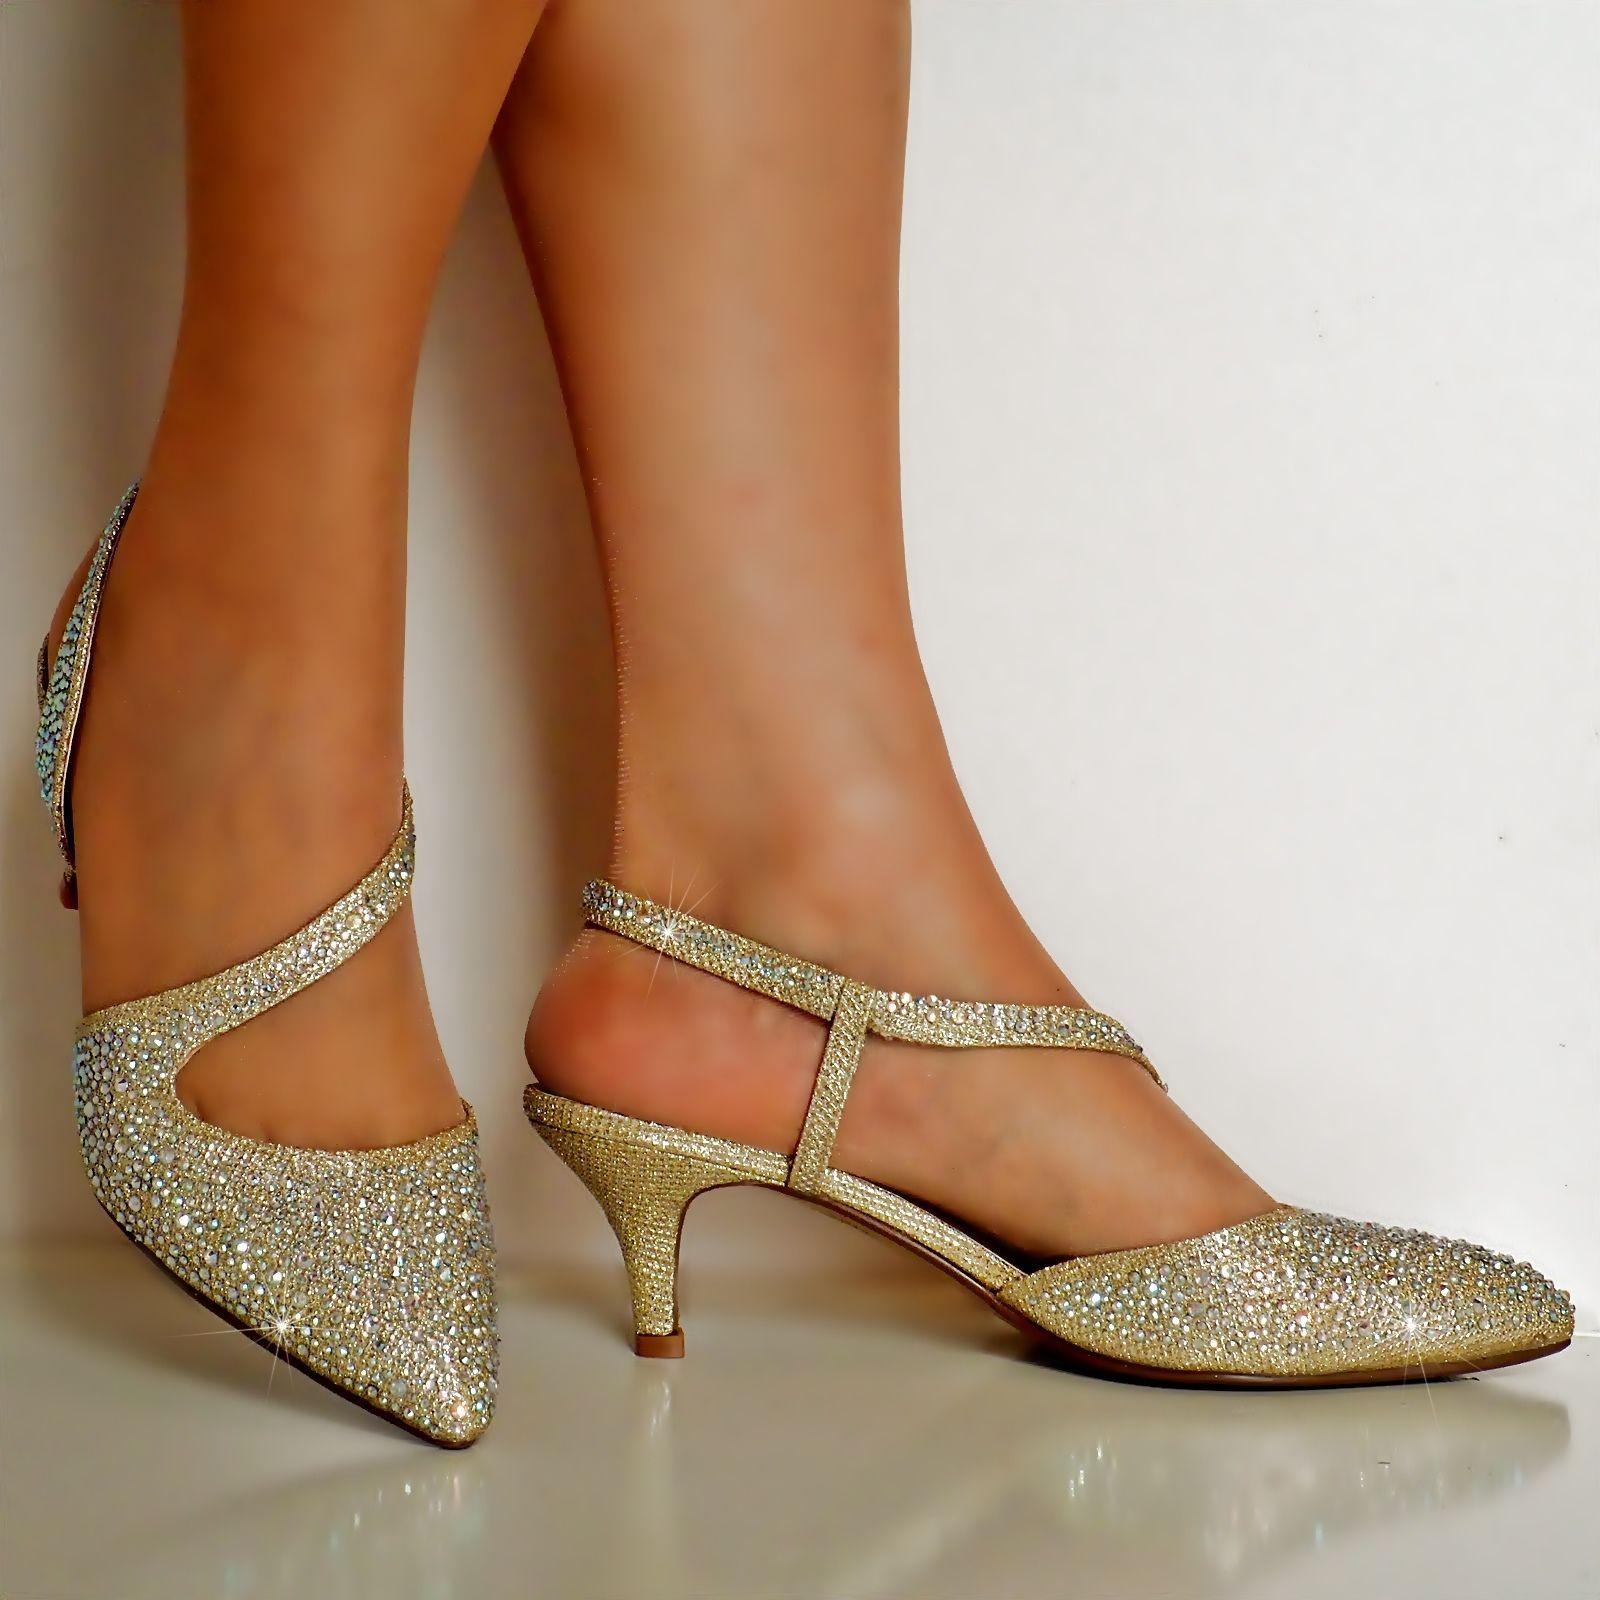 New Ladies Diamante Party Evening Prom Low Kitten Heel Court Shoe Size 007 Bridal Shoes Low Heel Kitten Heel Shoes Gold Shoes Heels